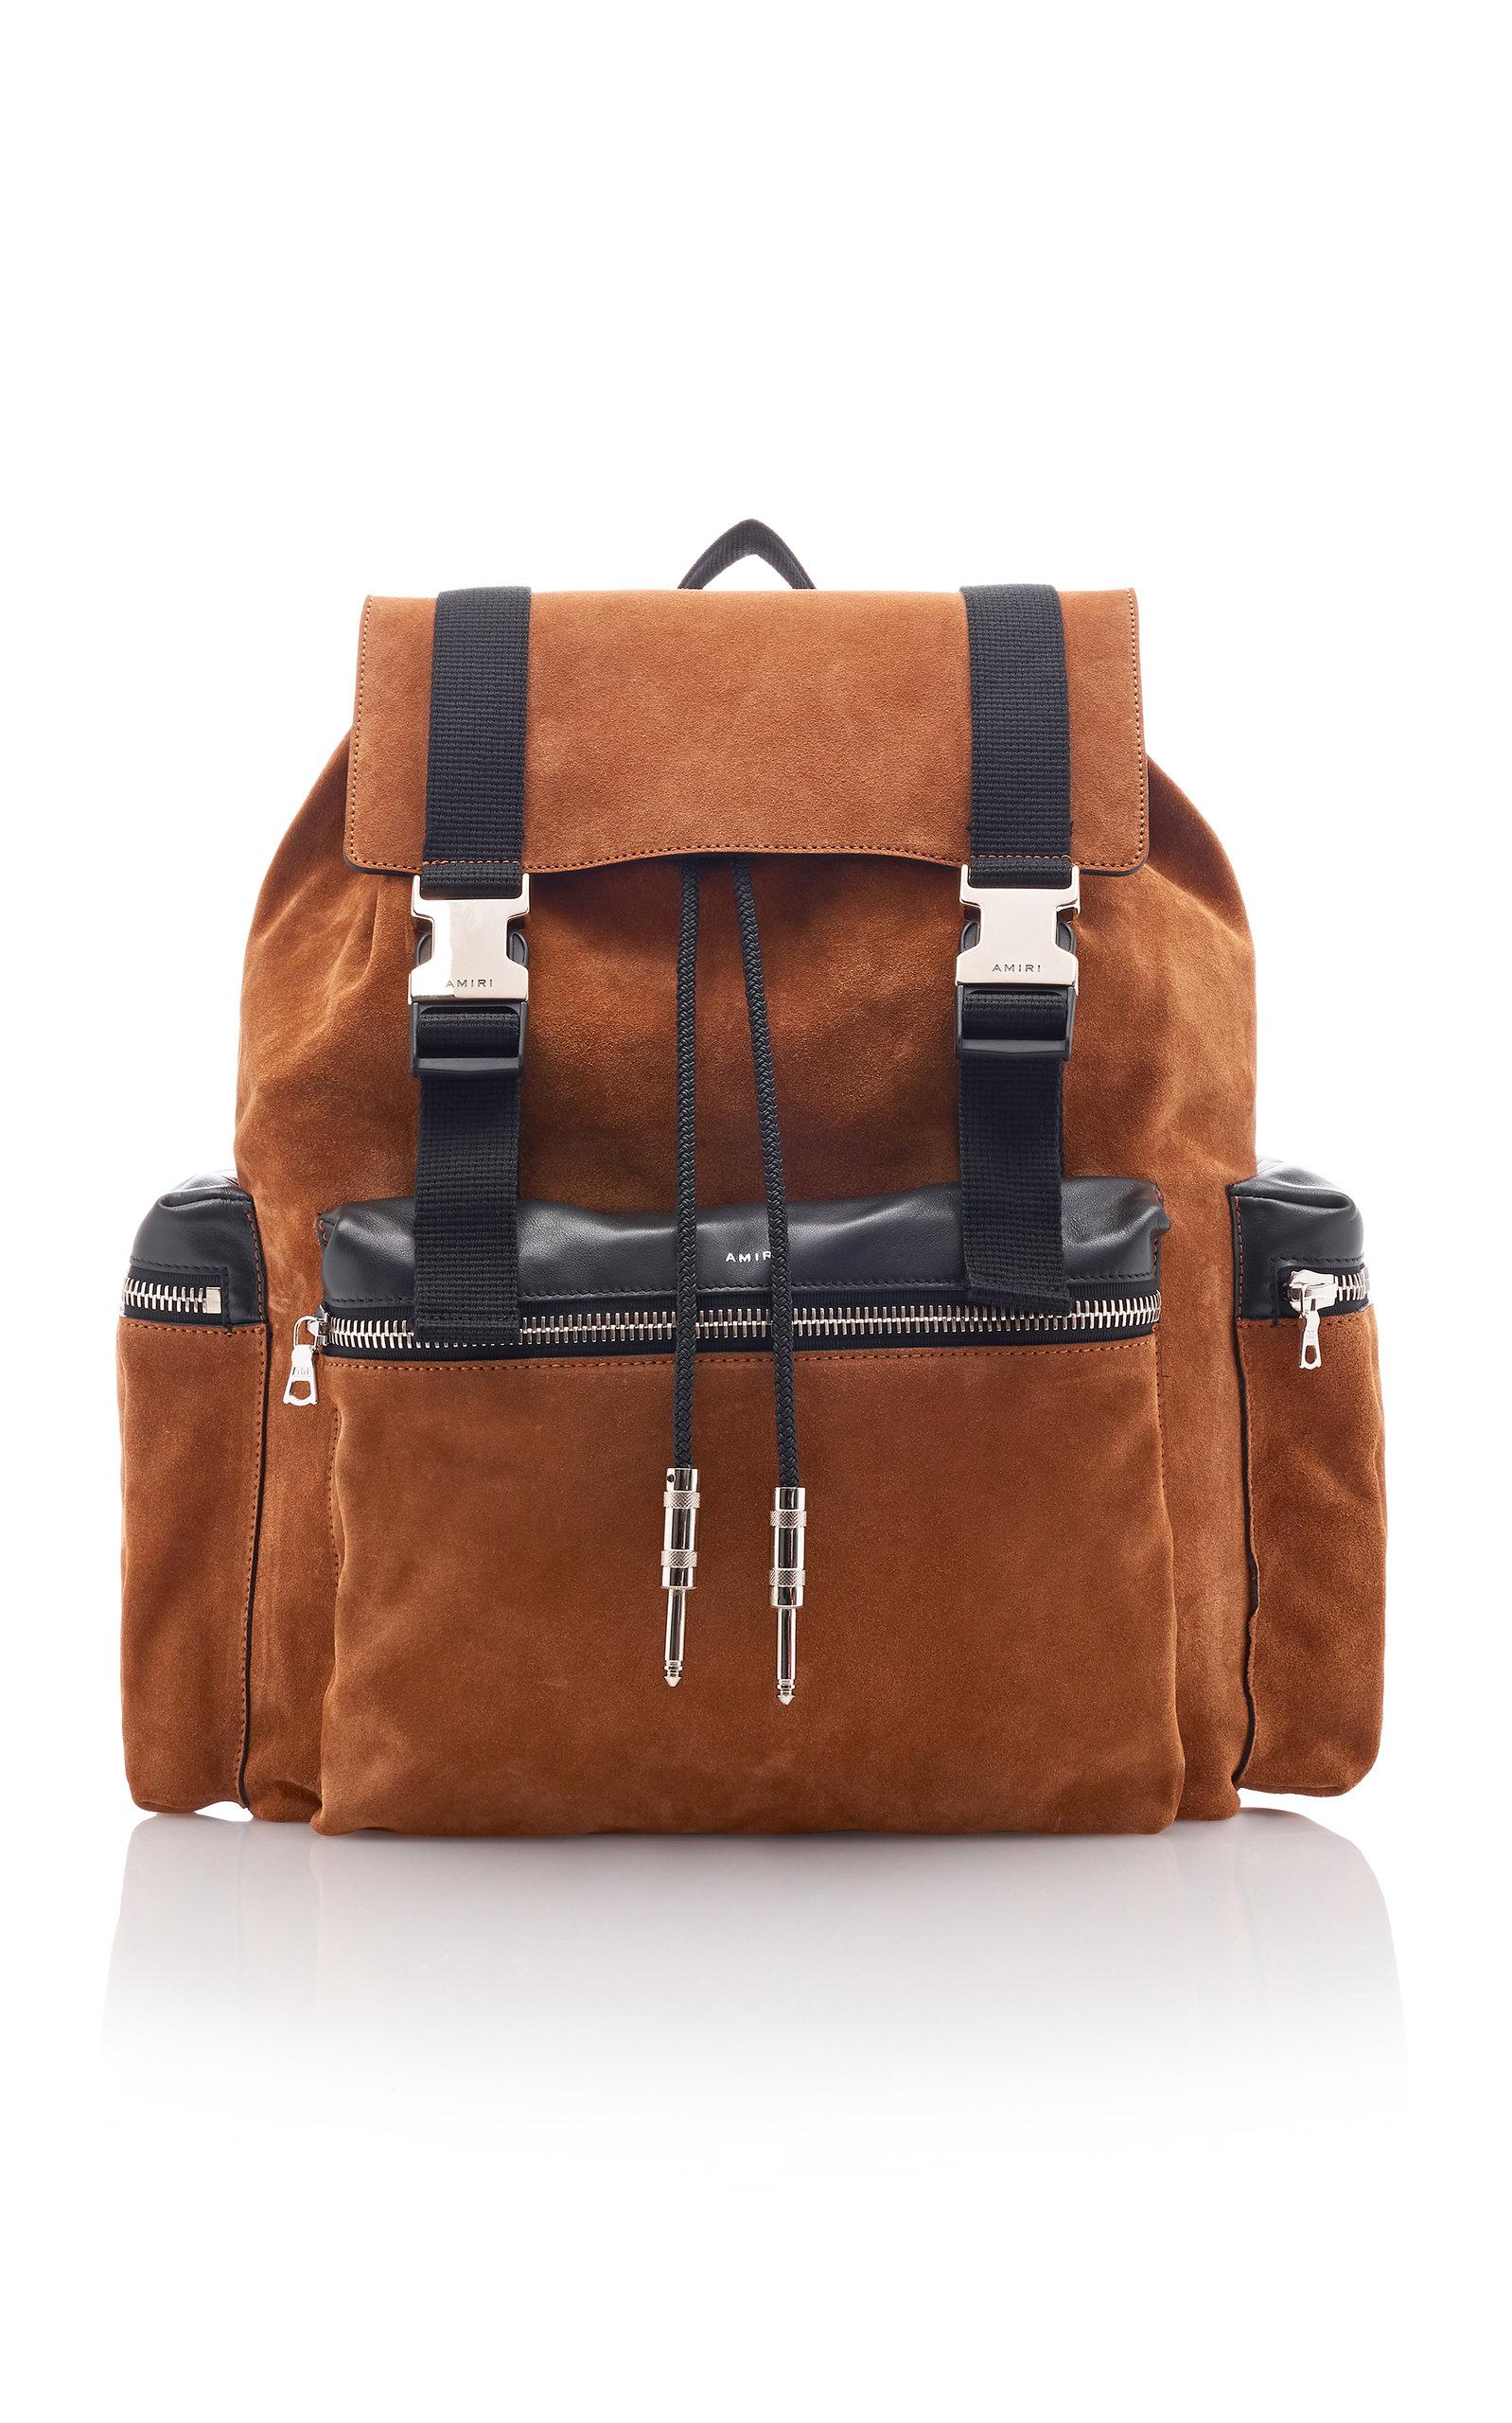 Amiri Backpacks Leather-Trimmed Suede Backpack